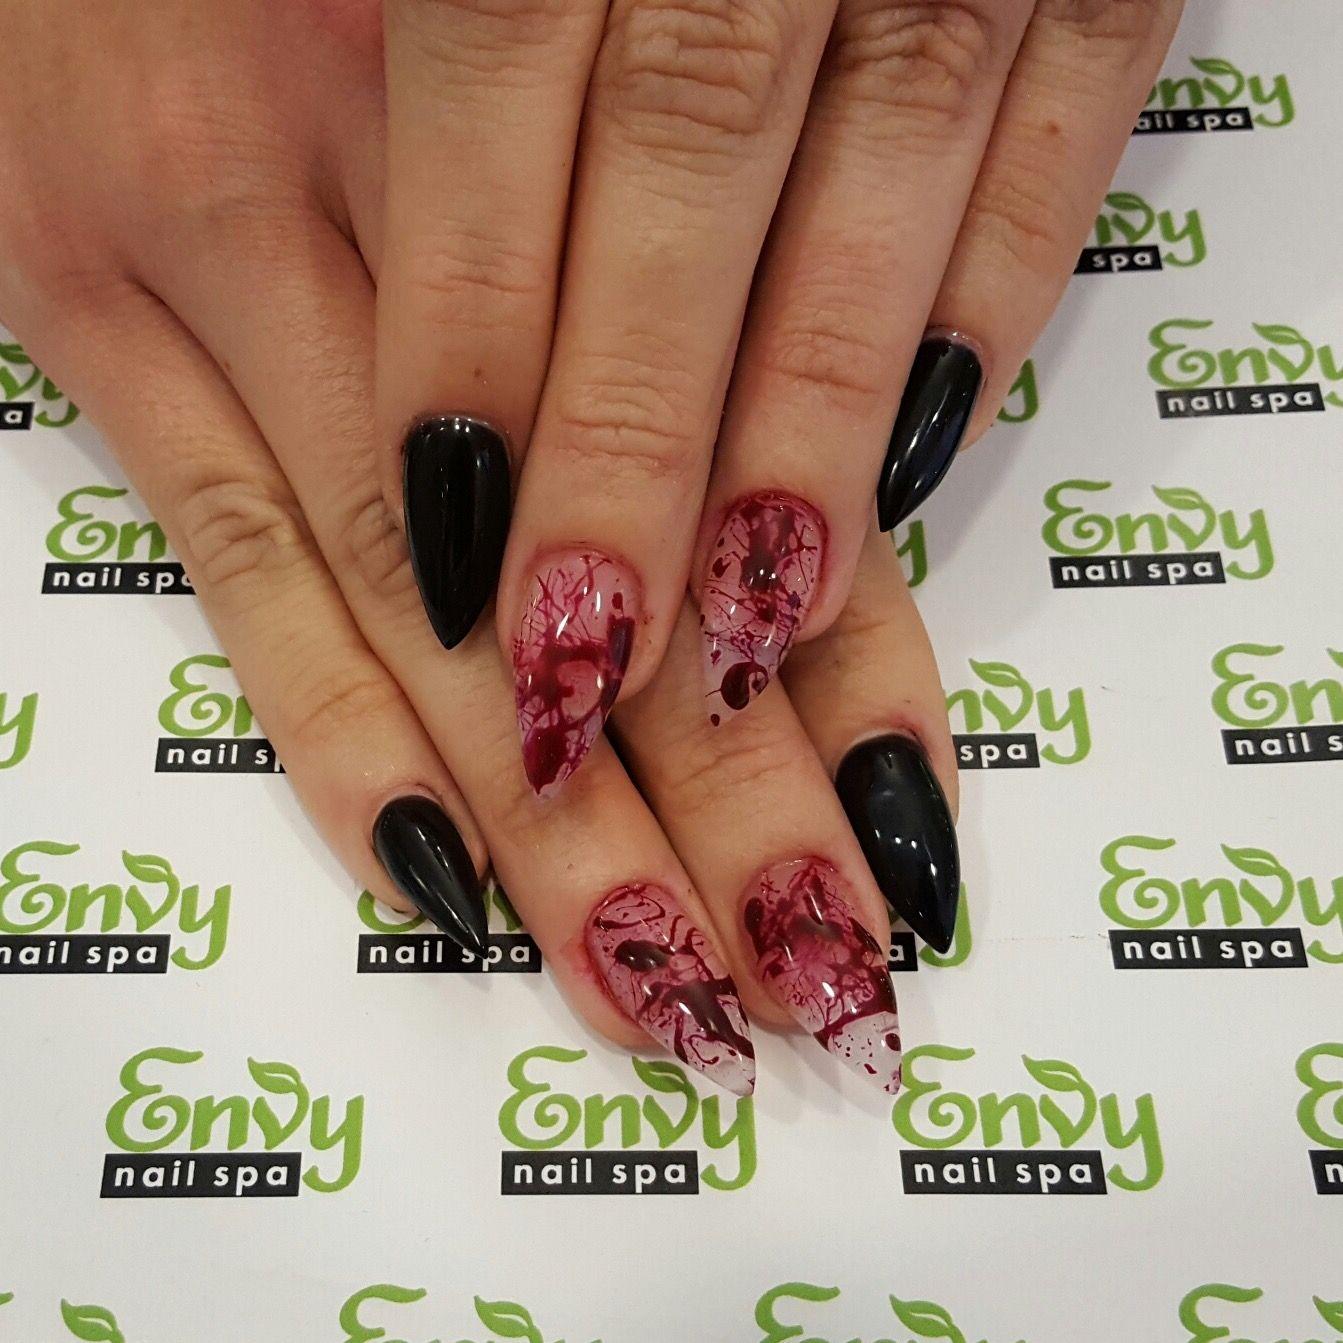 Blood Splatter, Black Nails - Envy Nail Spa | Halloween & The ...